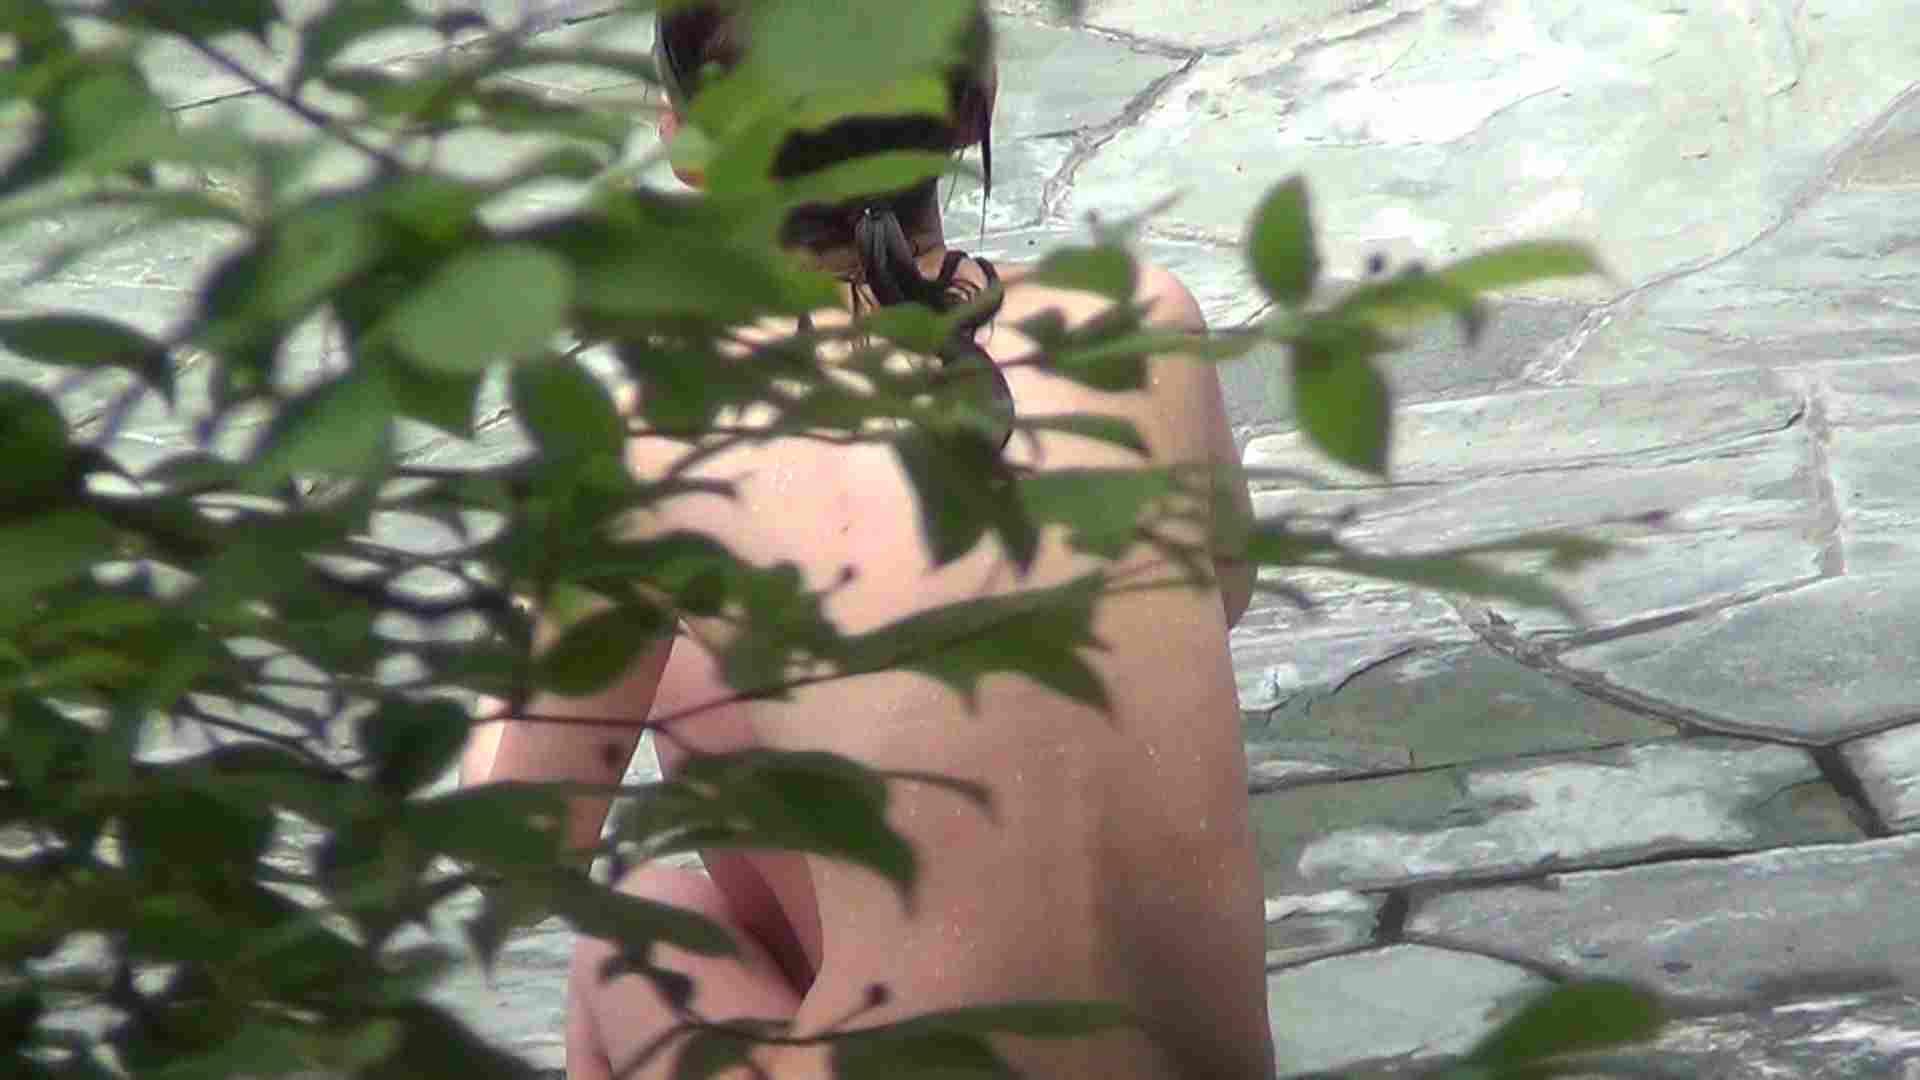 Vol.30 品のある美女 タオルと葉が憎い 高画質動画 オマンコ動画キャプチャ 78画像 69